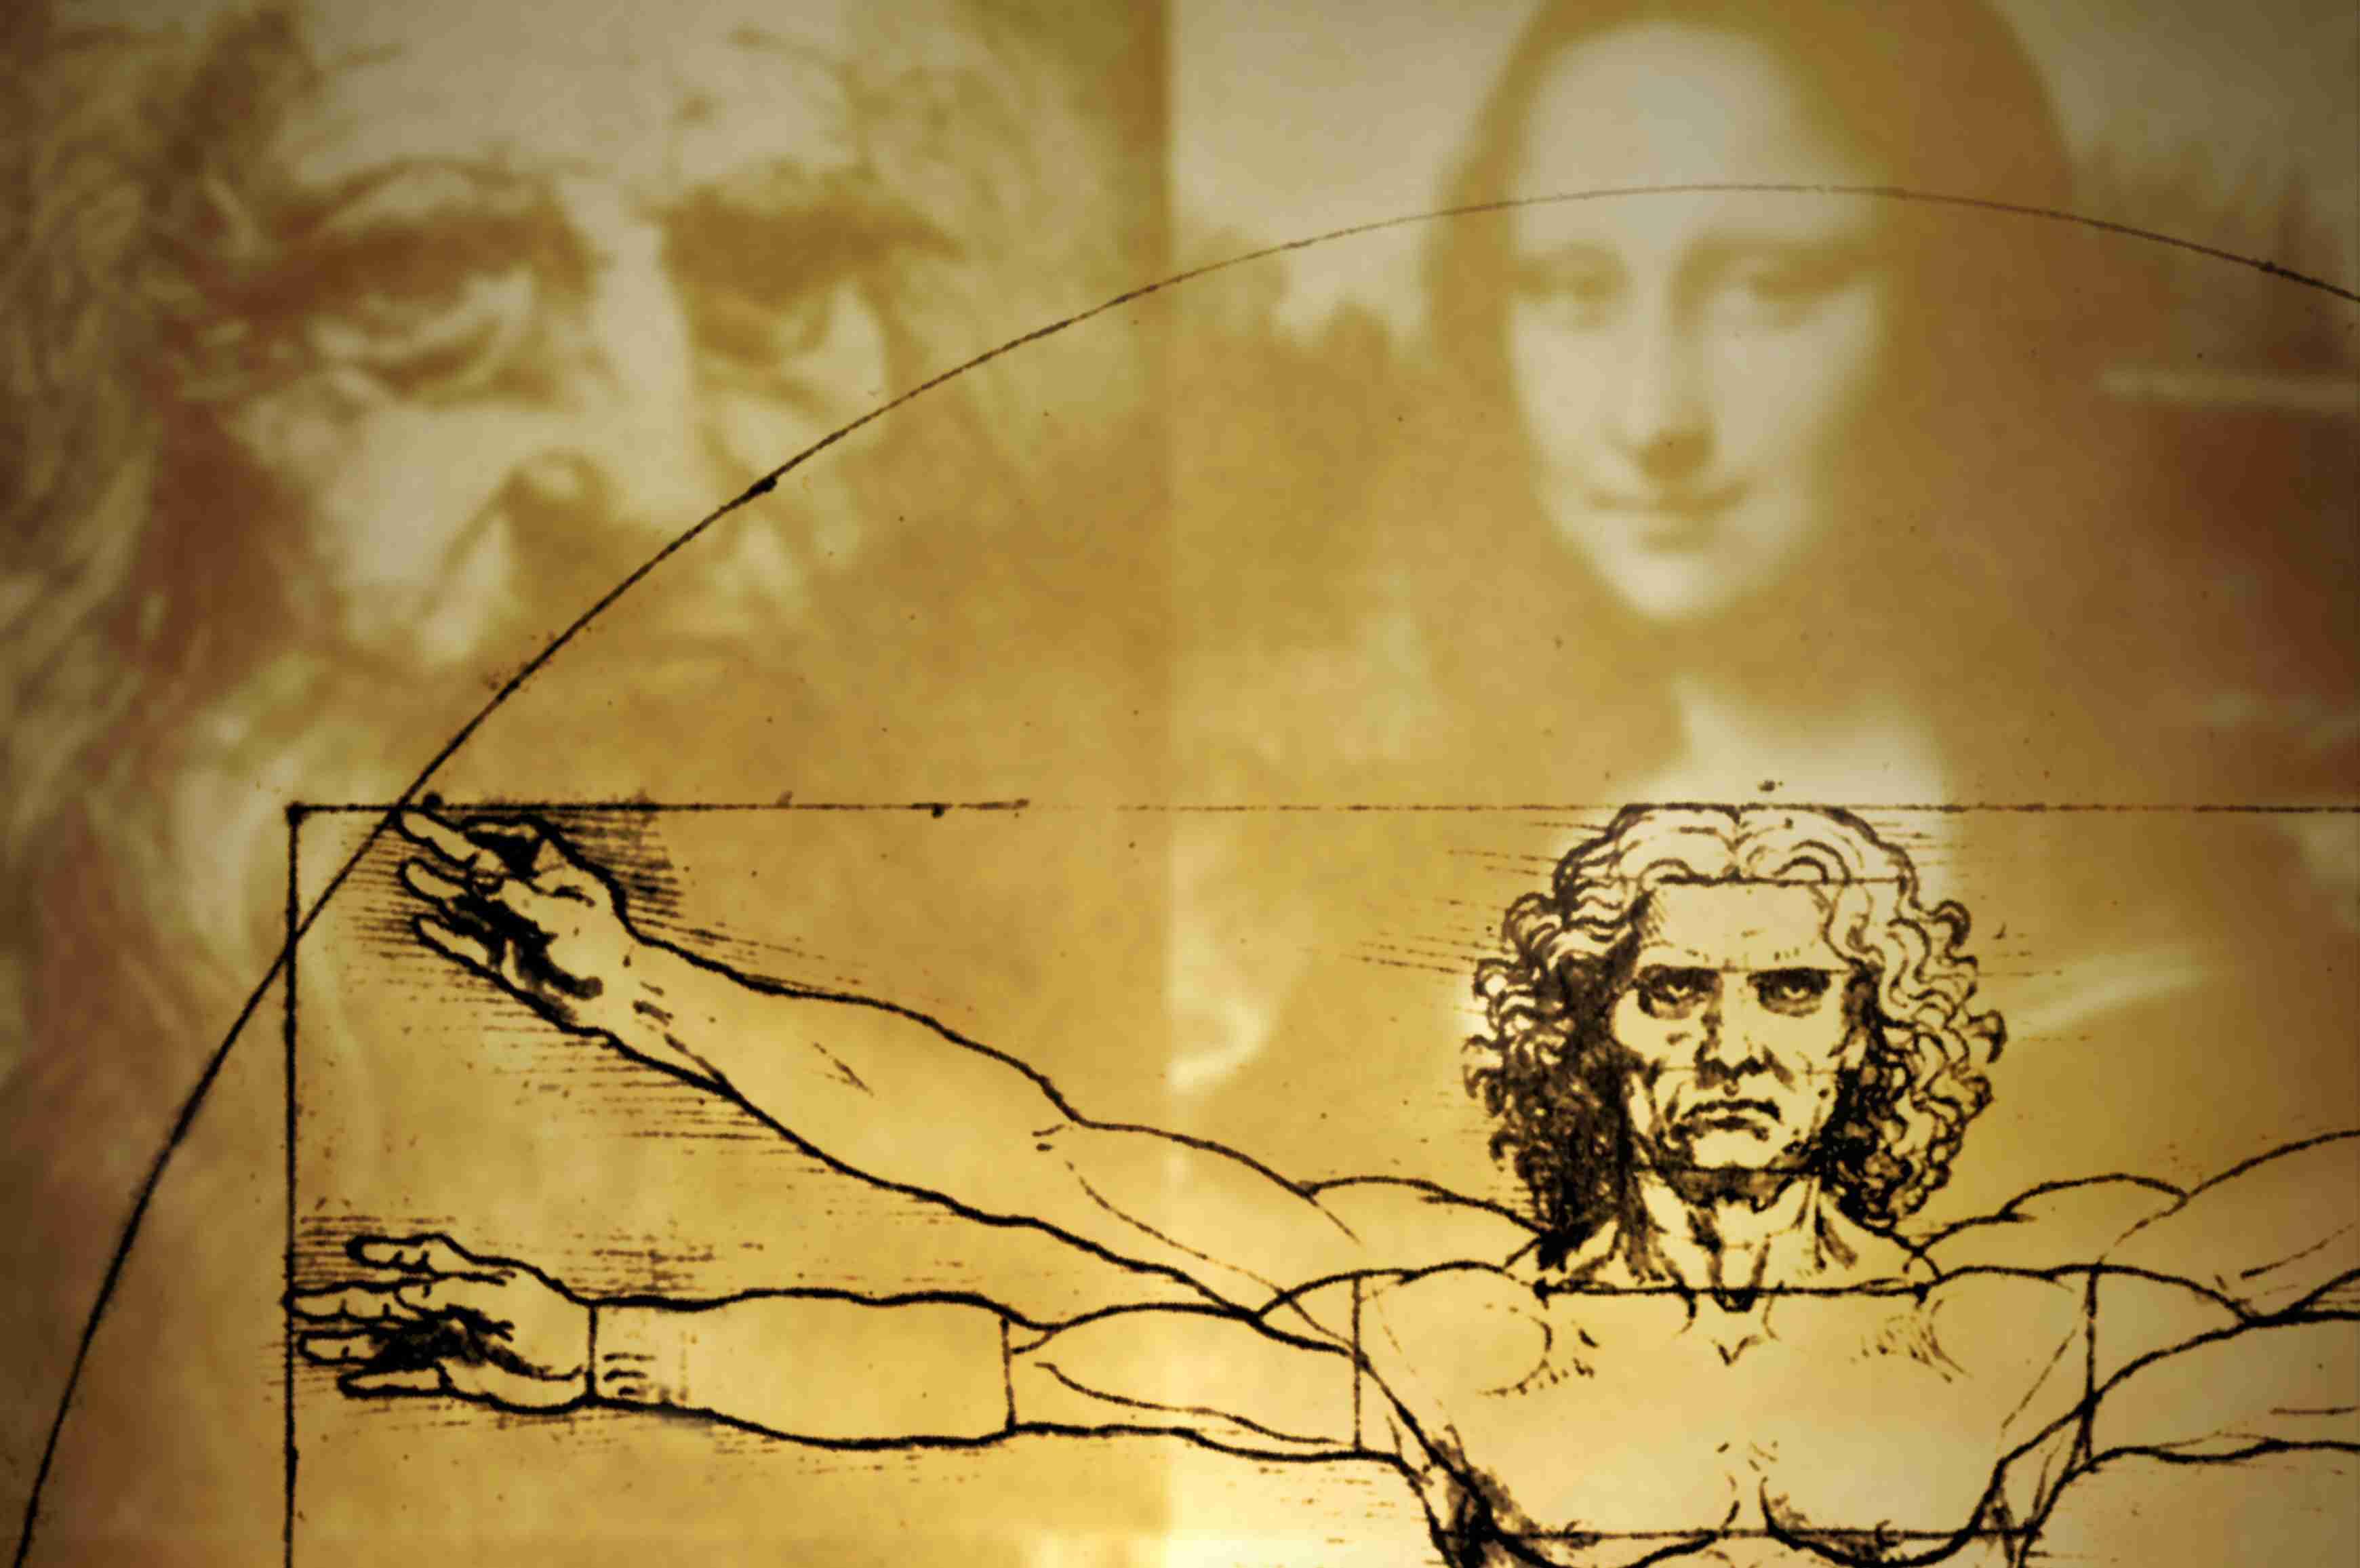 digital composite collage includes Vitruvian Man, Self Portrait, and the Mona Lisa